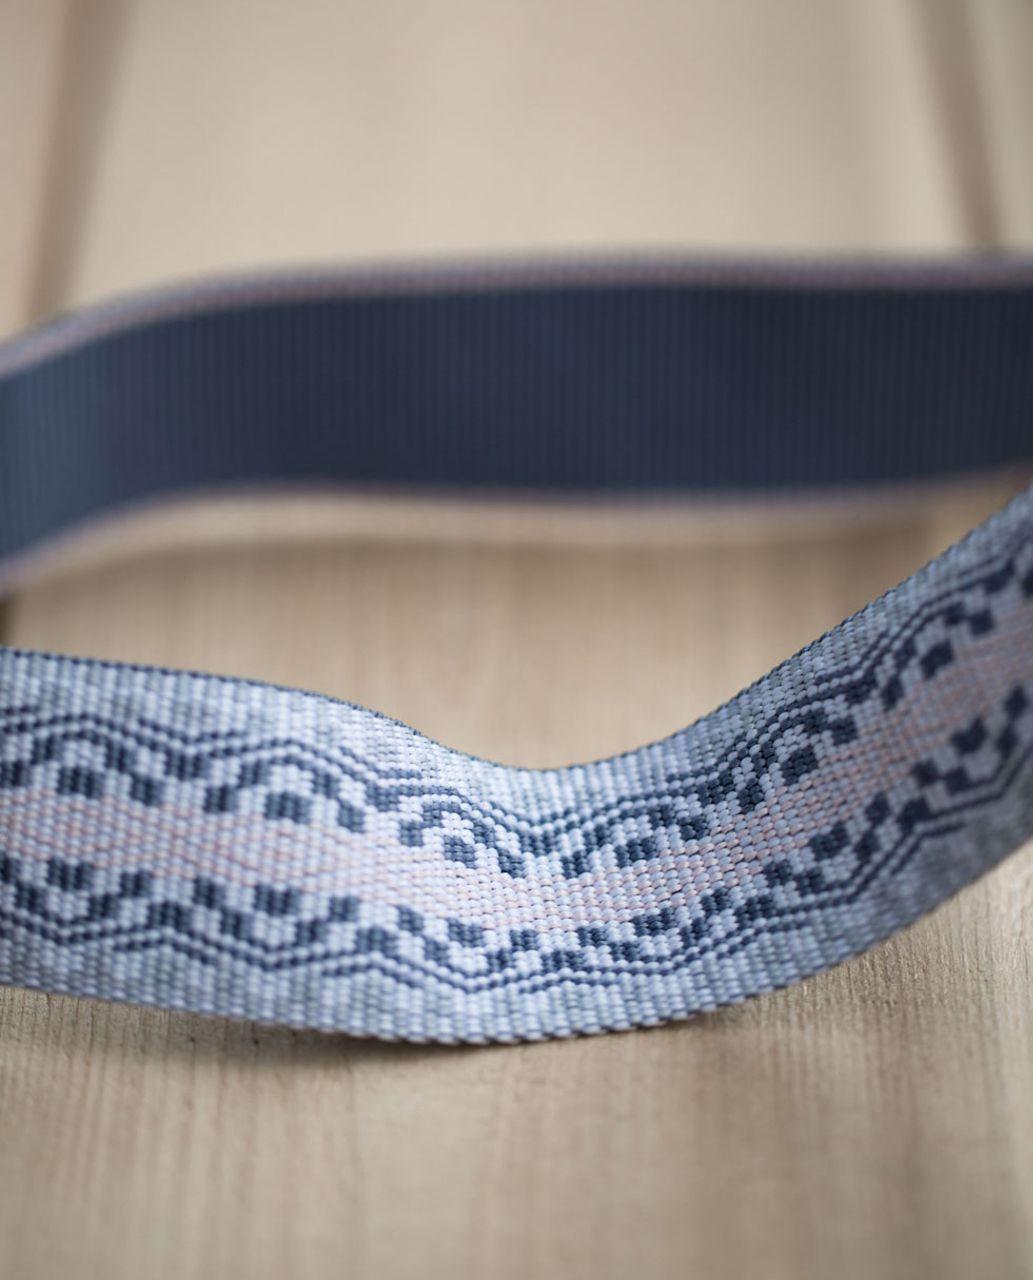 Lululemon Loop It Up Mat Strap - Blush Quartz / Blue Denim / Silver Fox / White